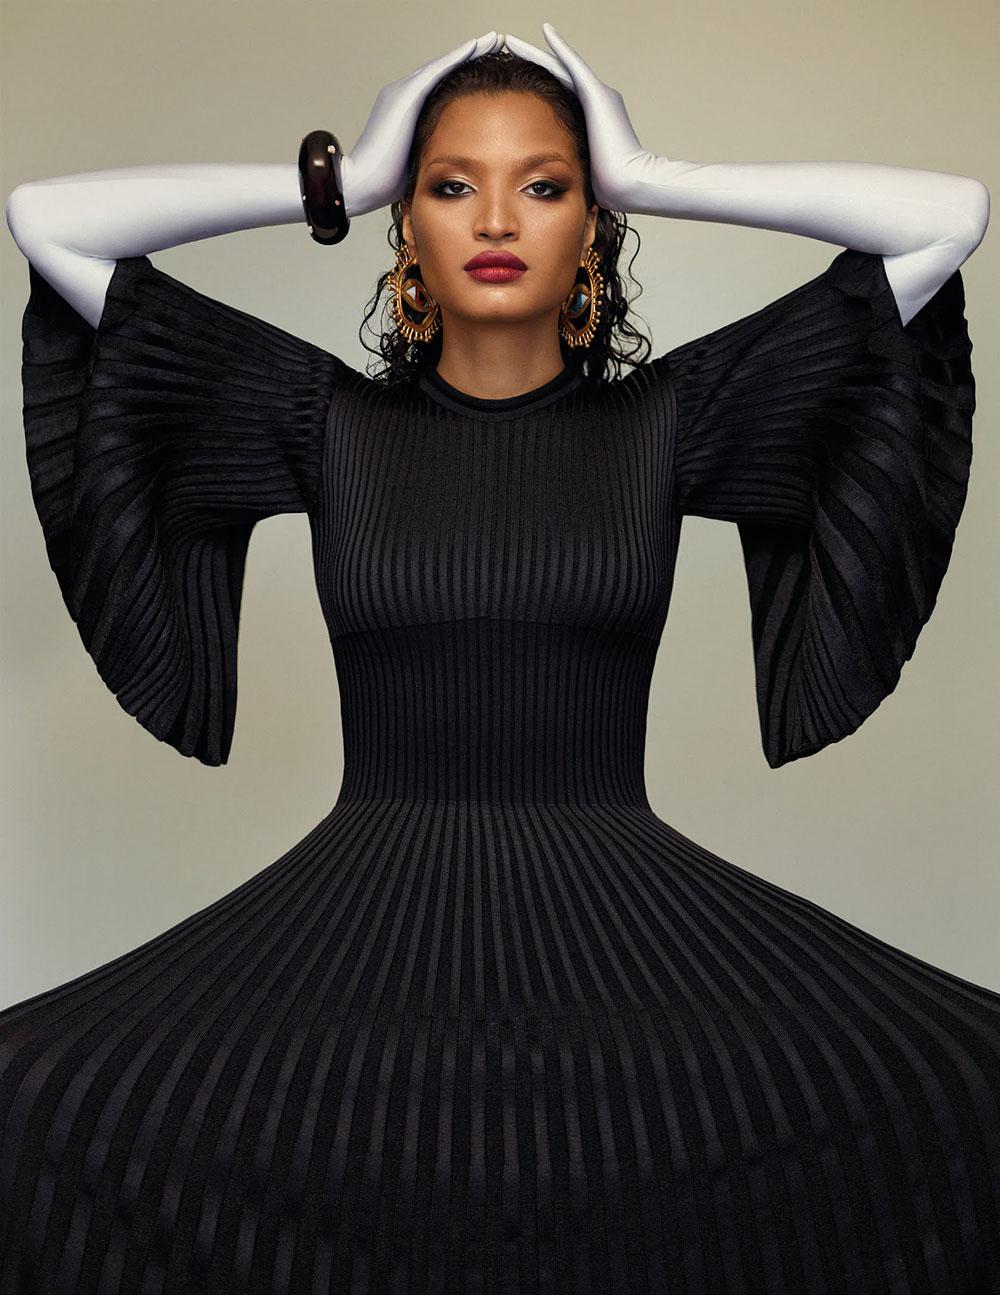 Indya Moore covers Vogue Spain November 2020 by Thomas Whiteside